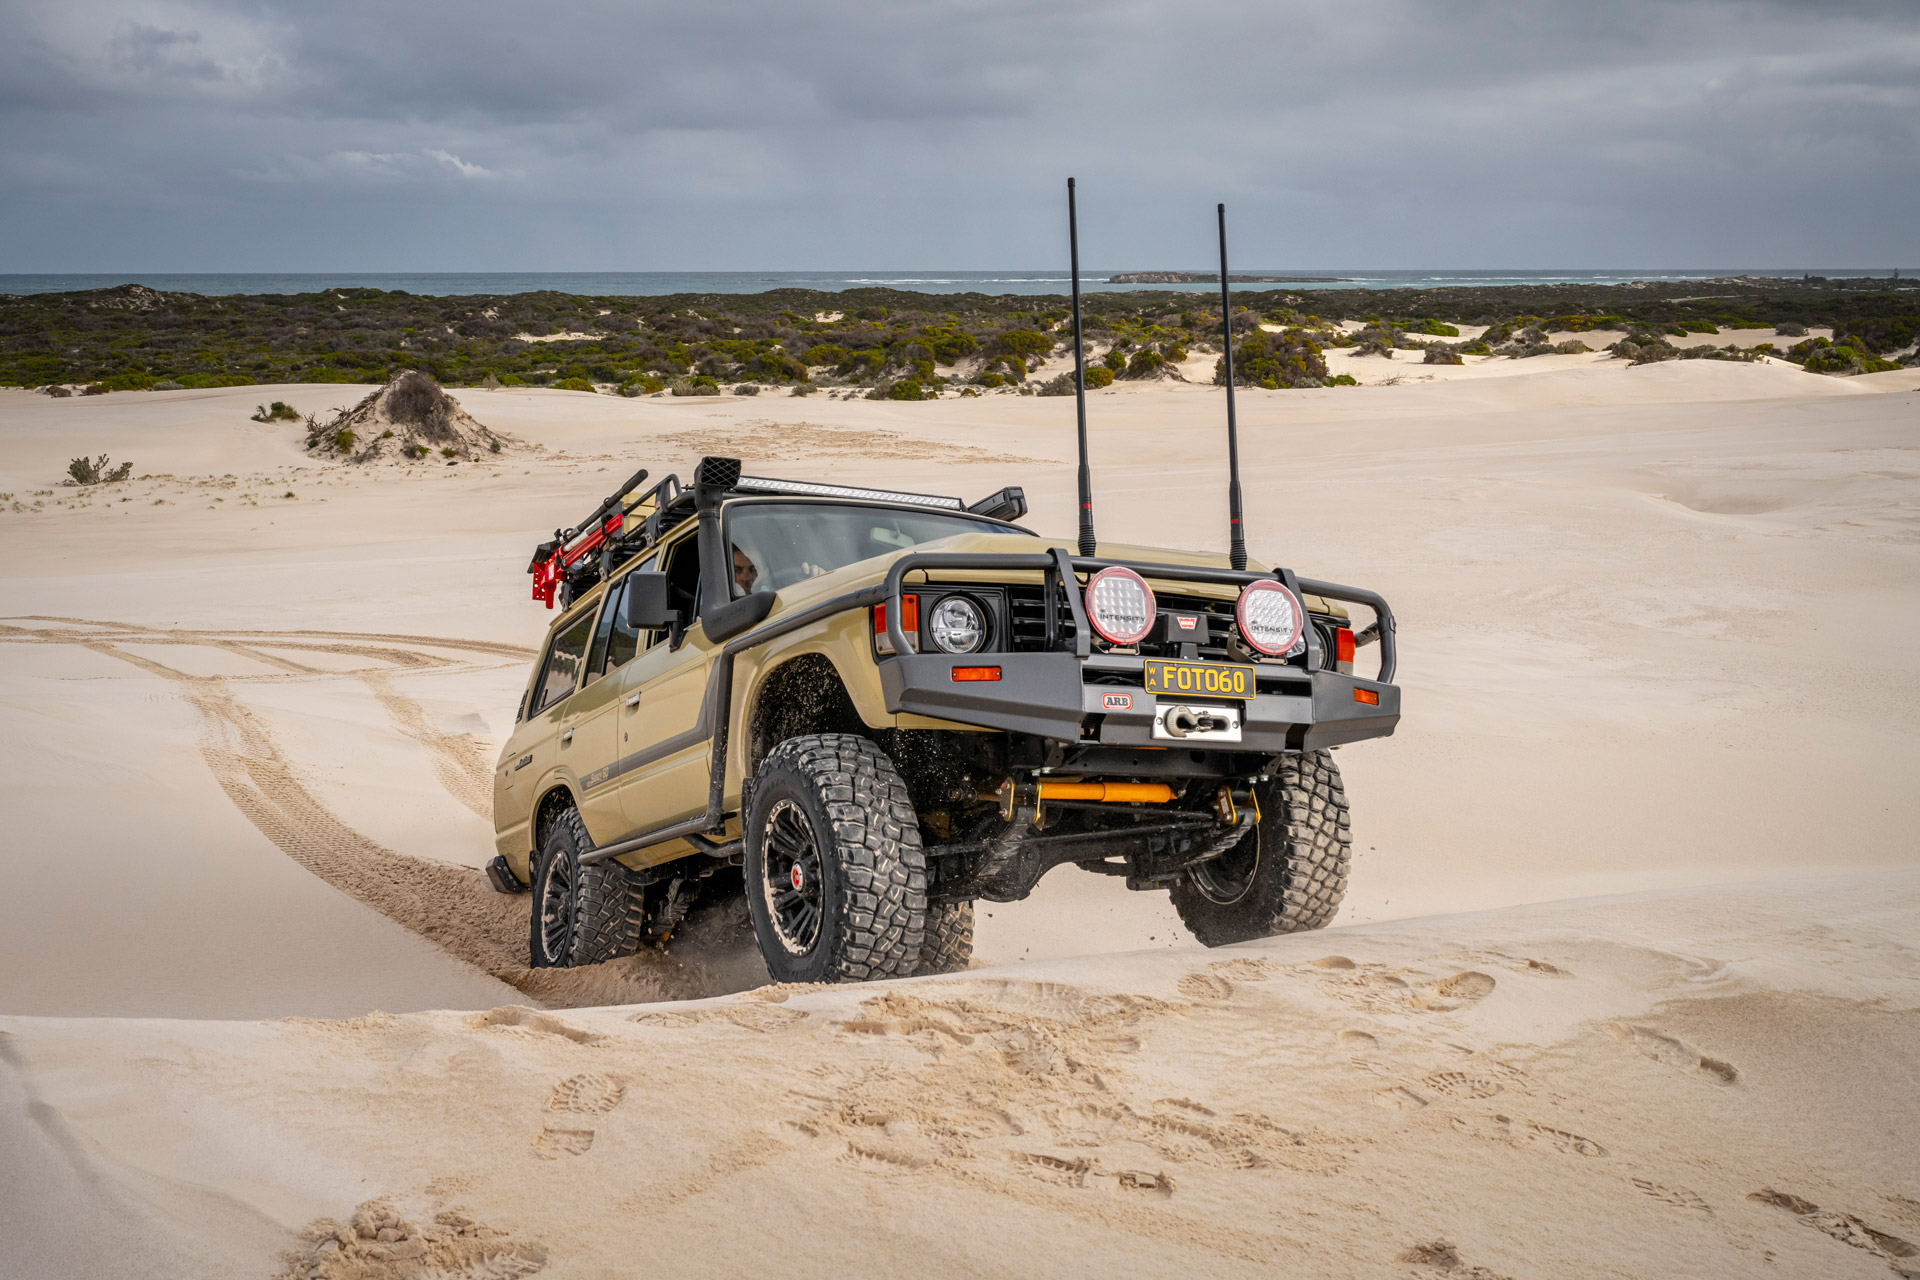 ROH Vapour wheels on Sandy 60 Series LandCruiser driving up sand dunes